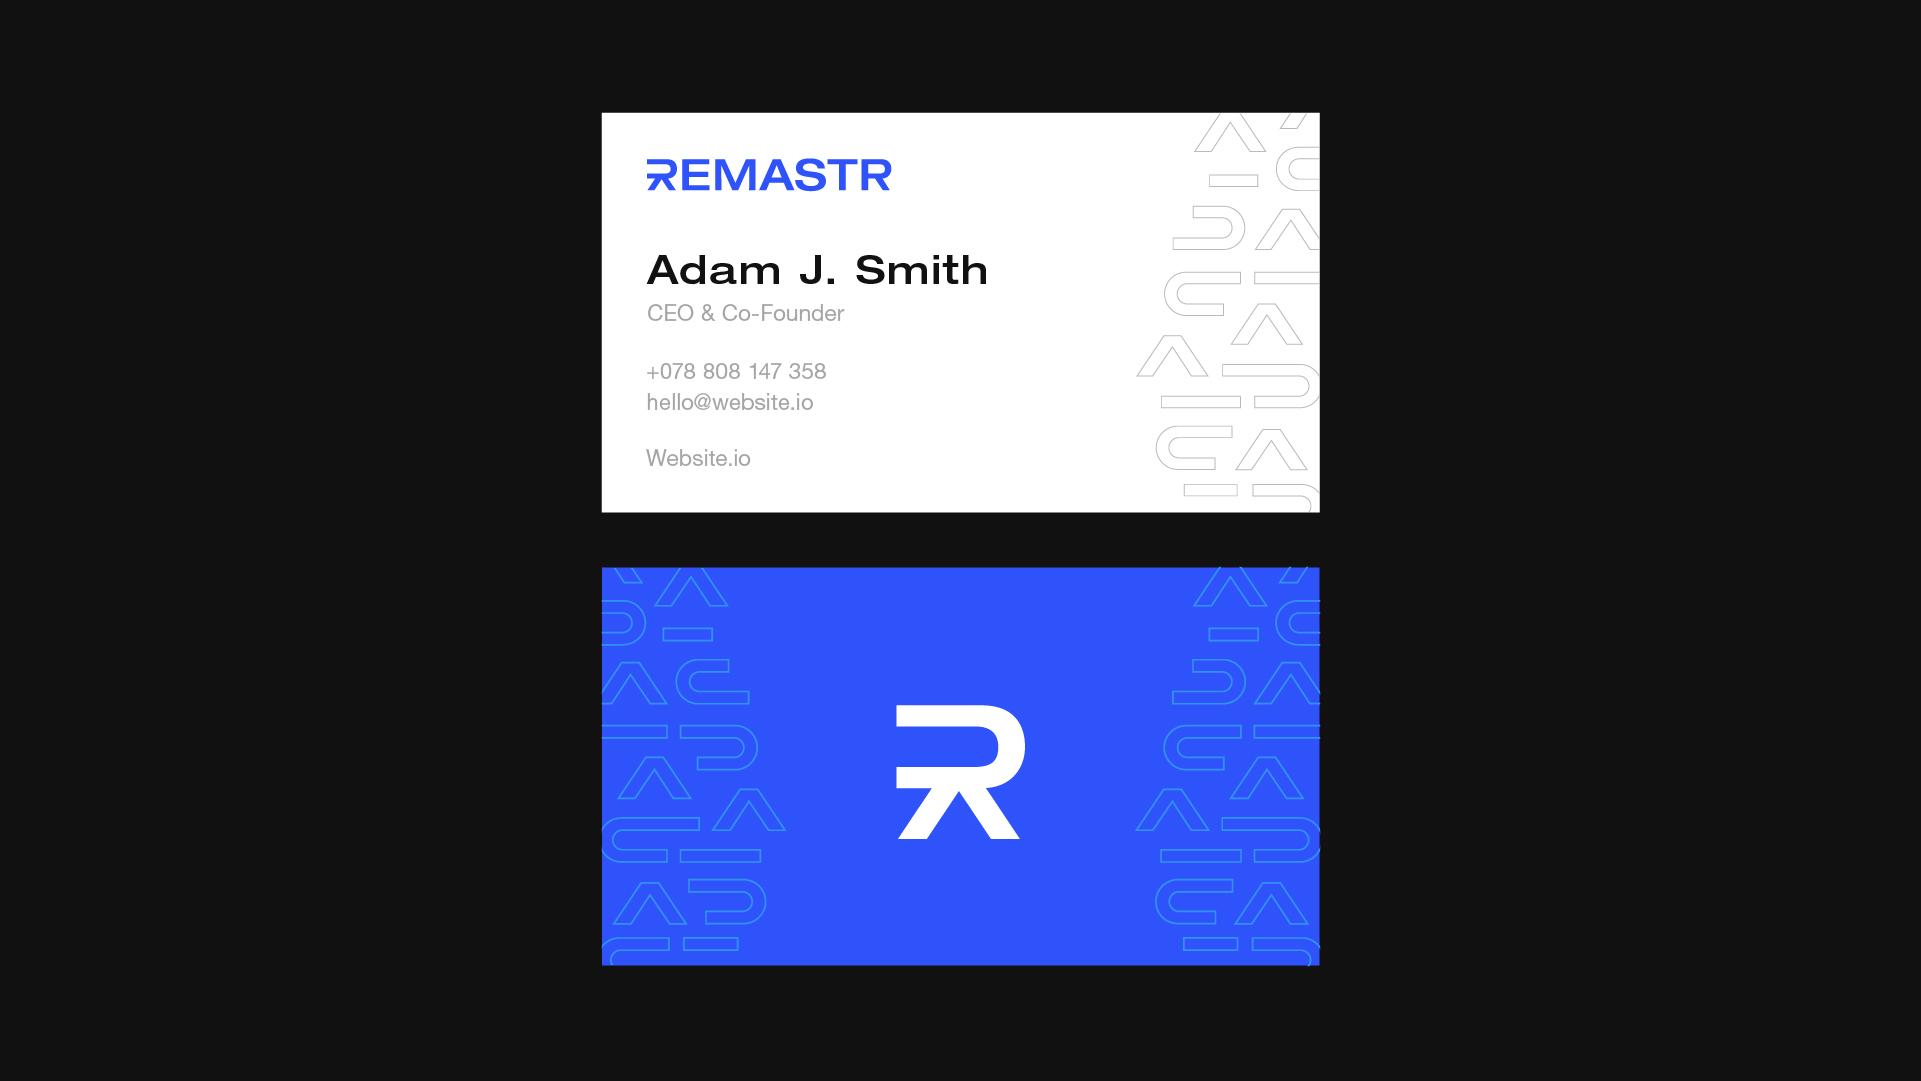 remastr business cards